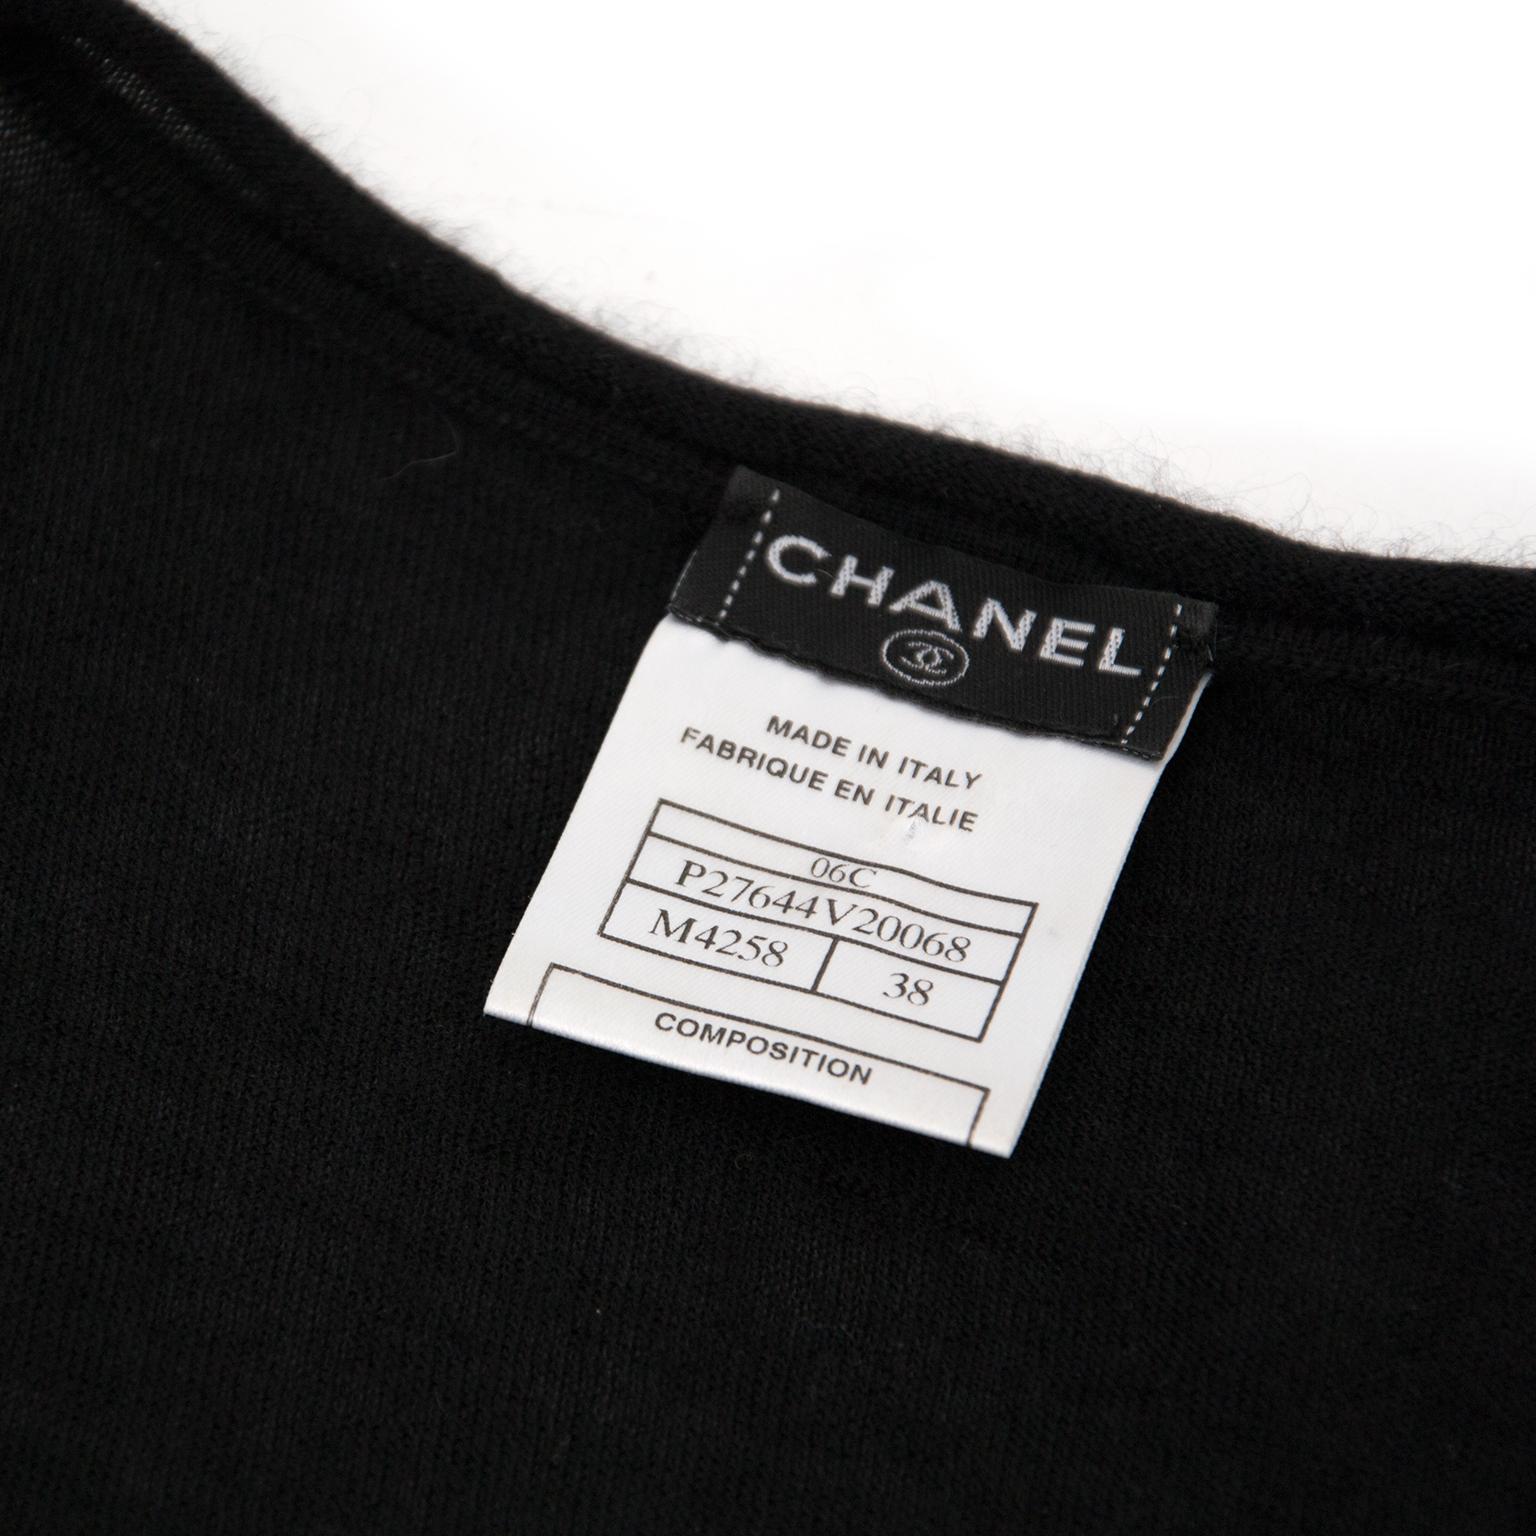 Chanel Cashmere Paris Top - Size 38 available online at Labellov.com